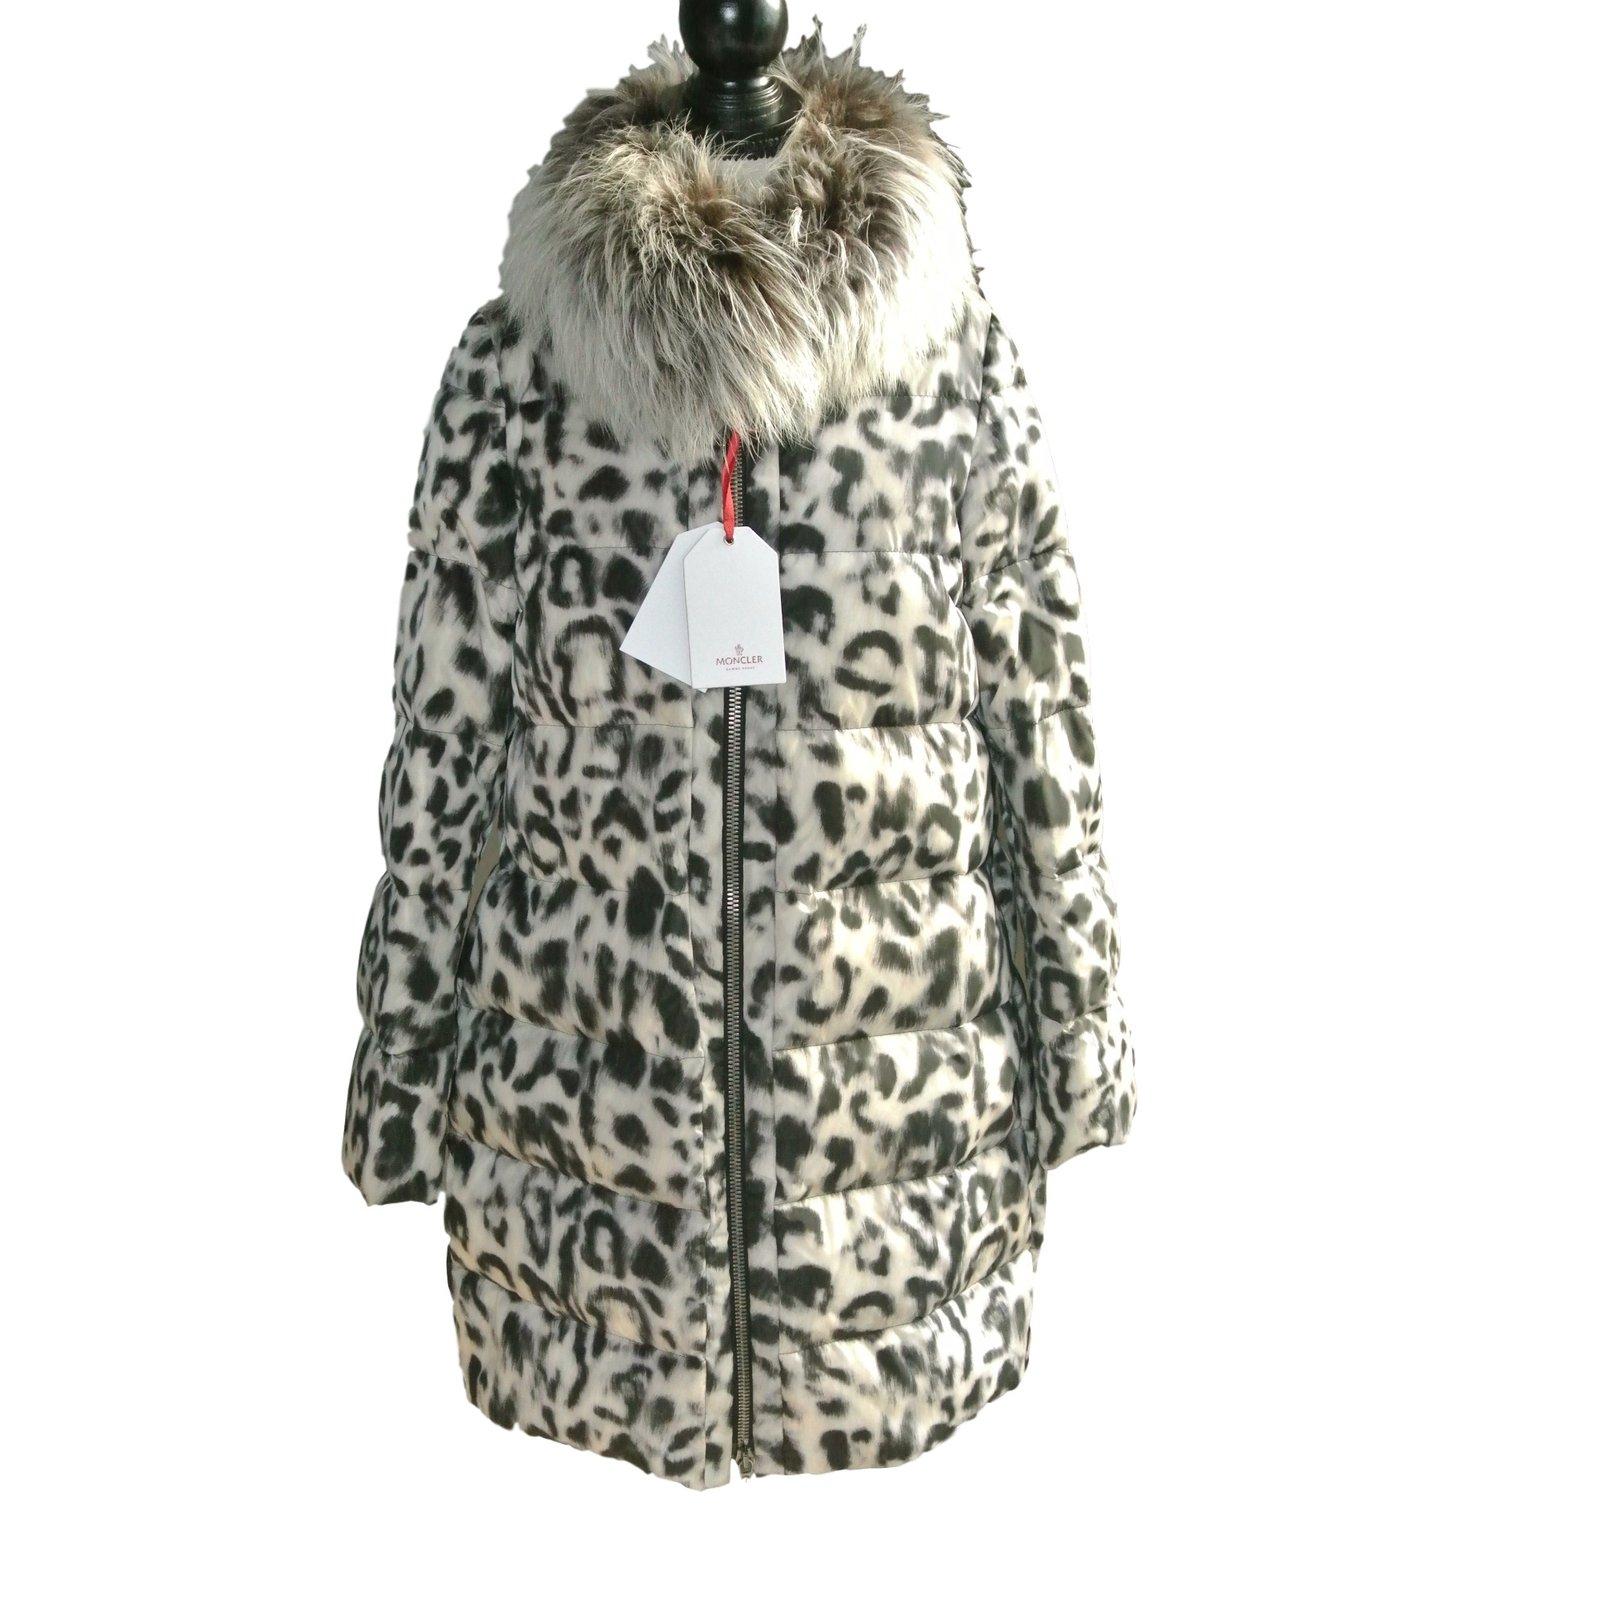 inspirant porte manteau buste femme l 39 id e d 39 un porte. Black Bedroom Furniture Sets. Home Design Ideas